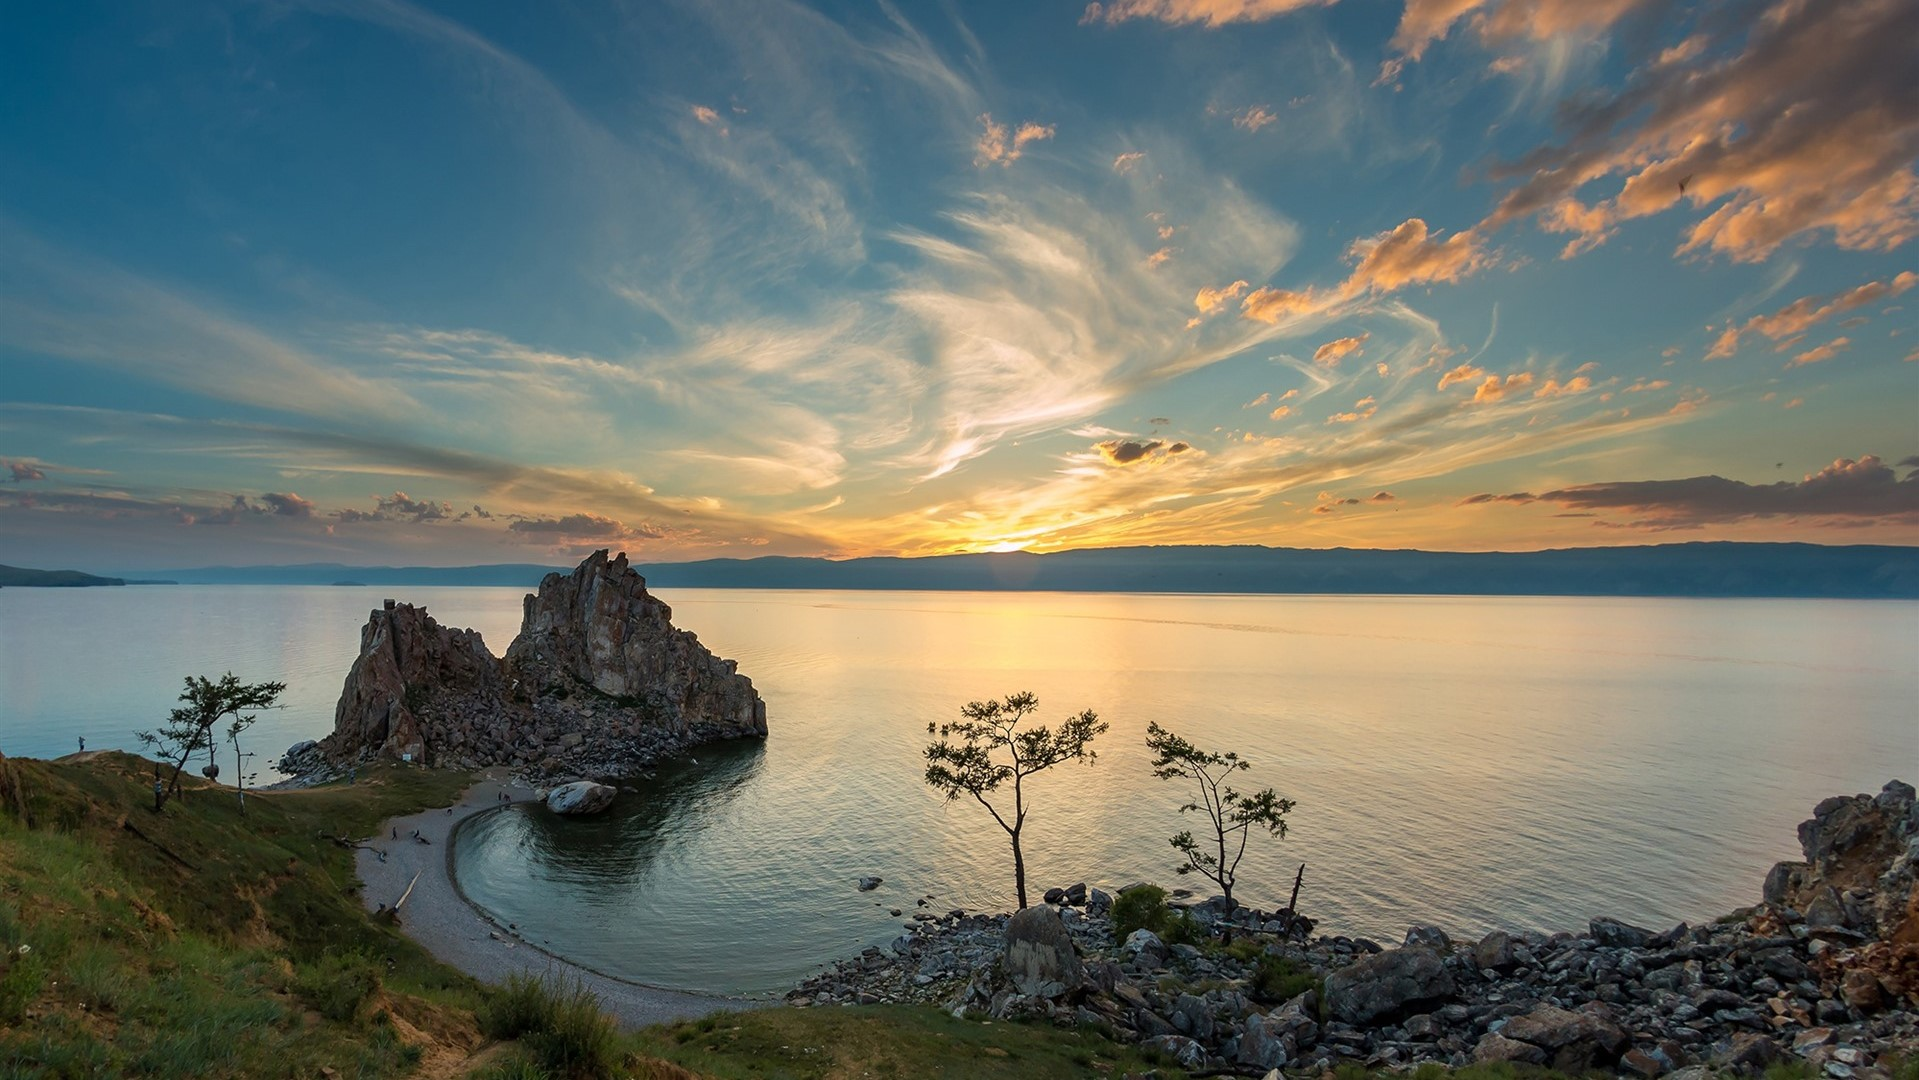 Olkhon island and Maloe More (Small Sea)